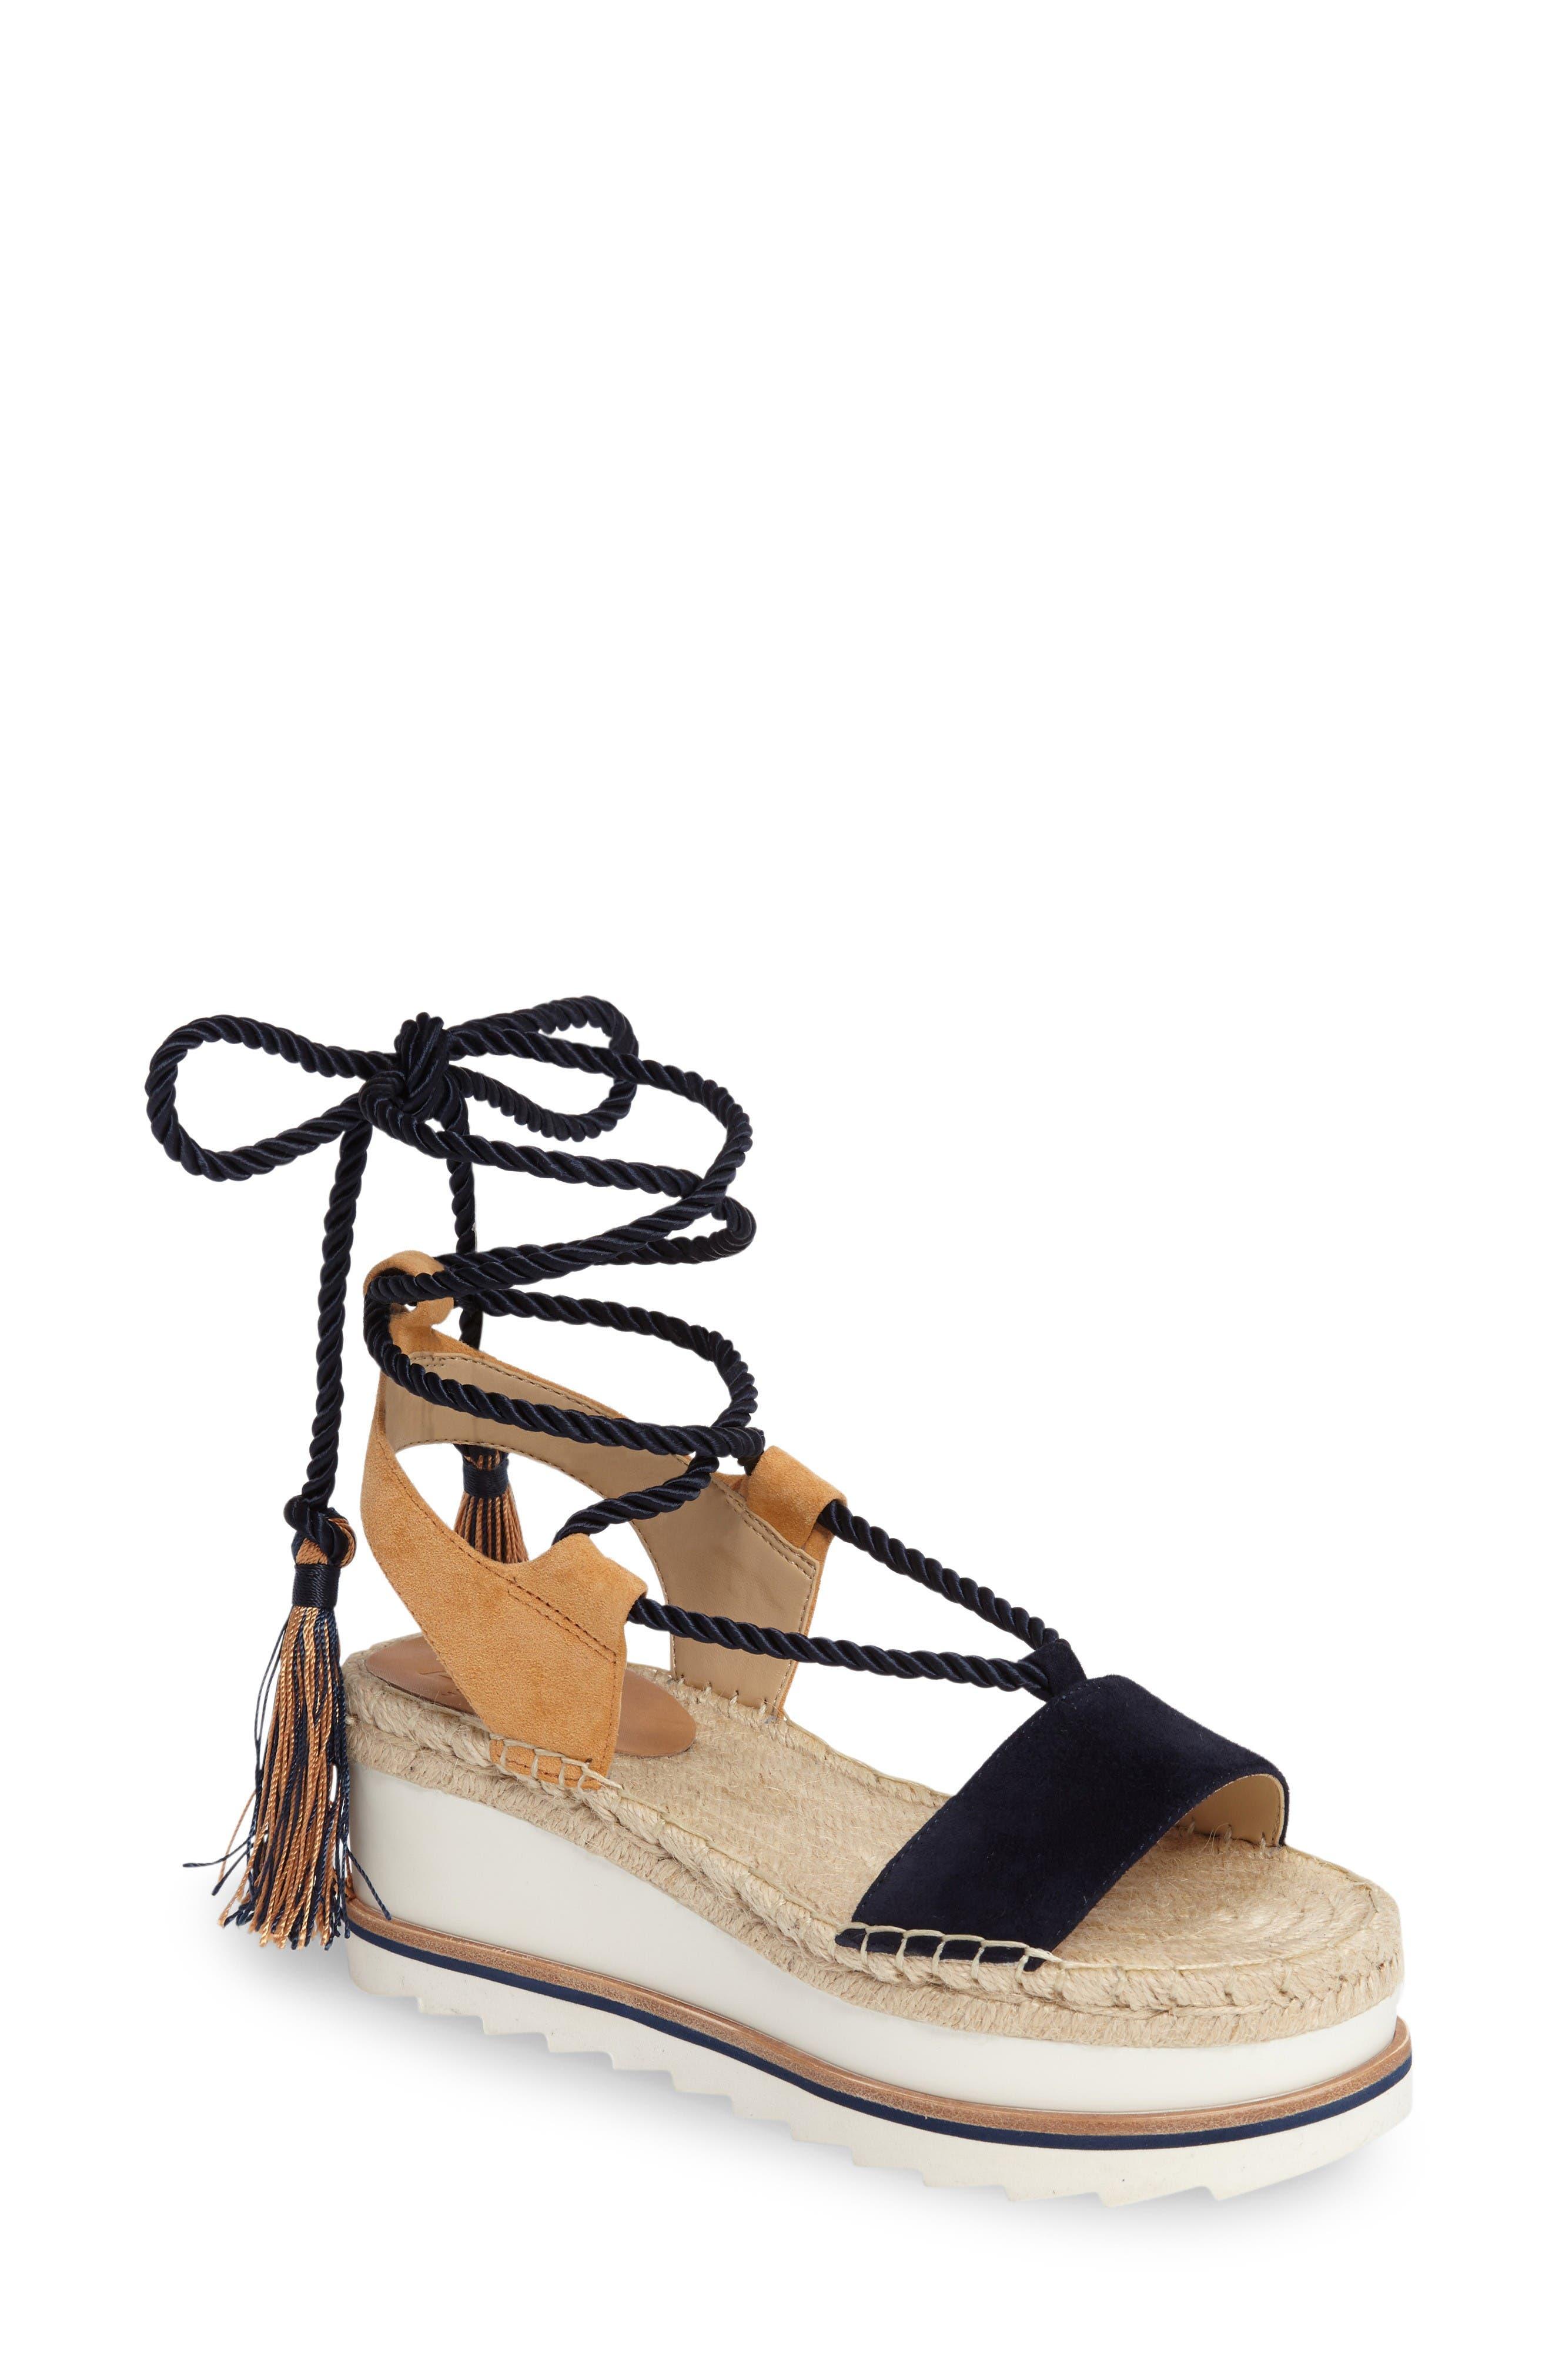 Main Image - Marc Fisher LTD Gerald Platform Sandal (Women)